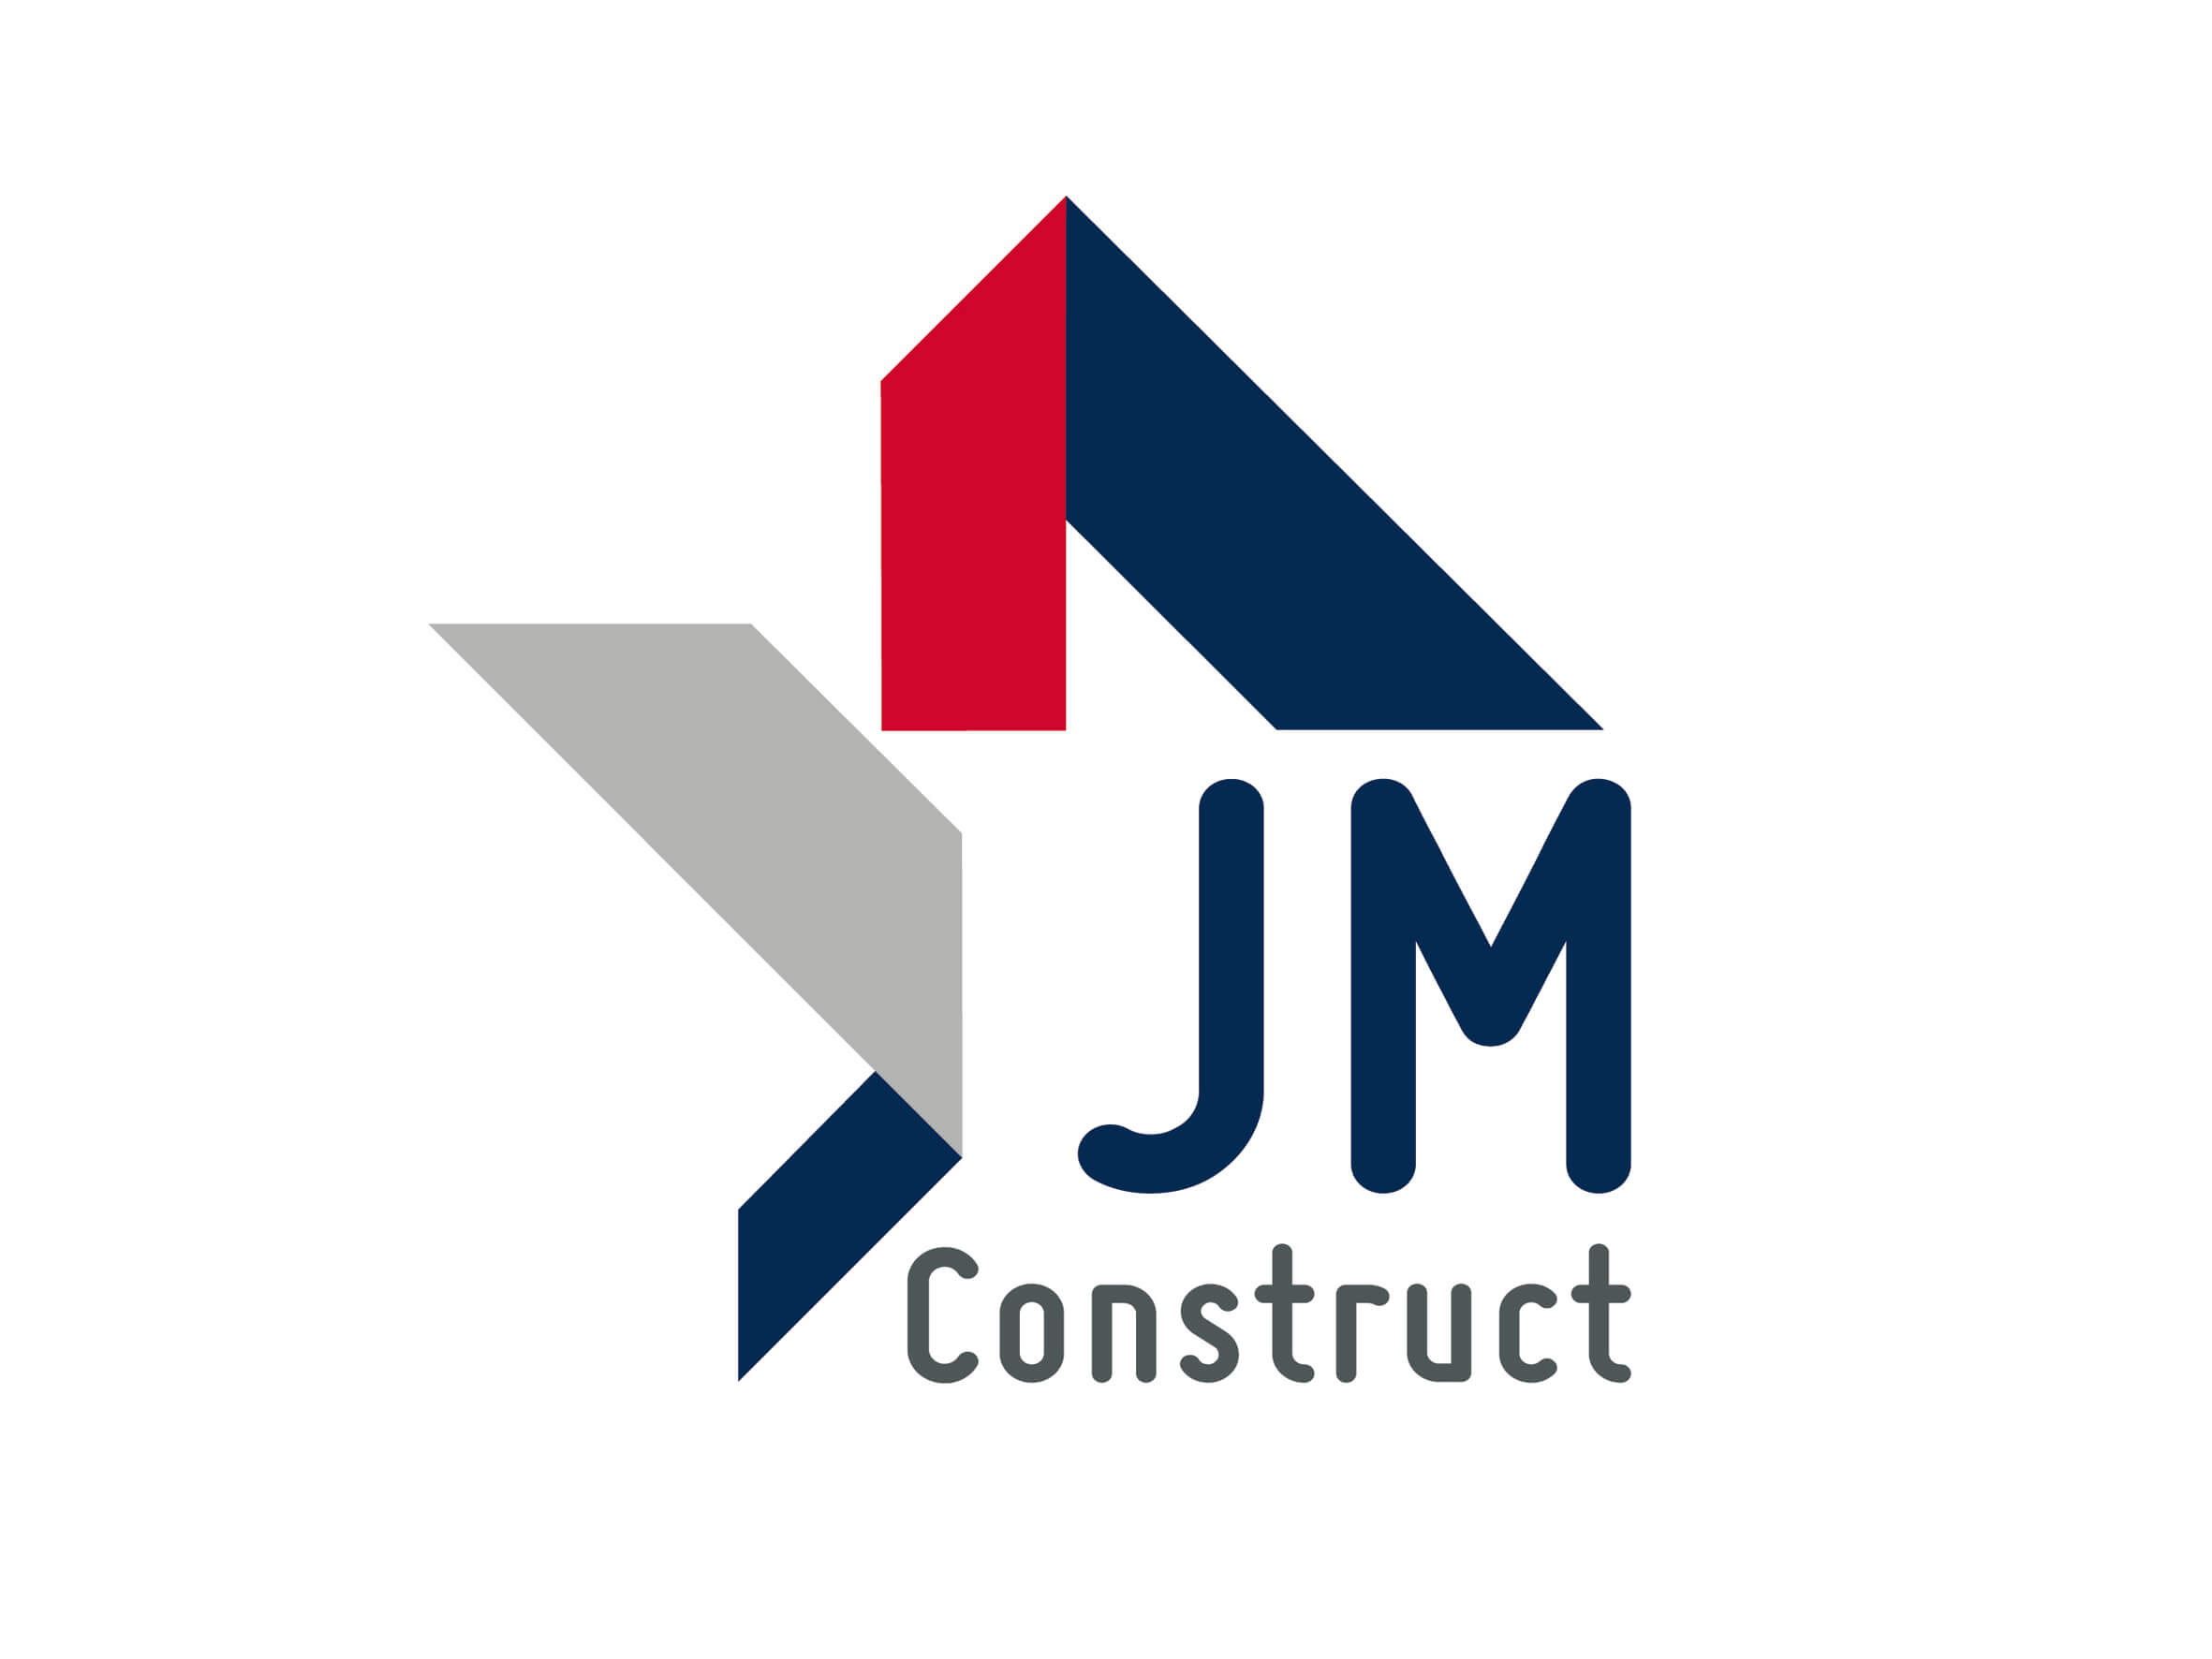 JM Designed by andchic | BrandCrowd